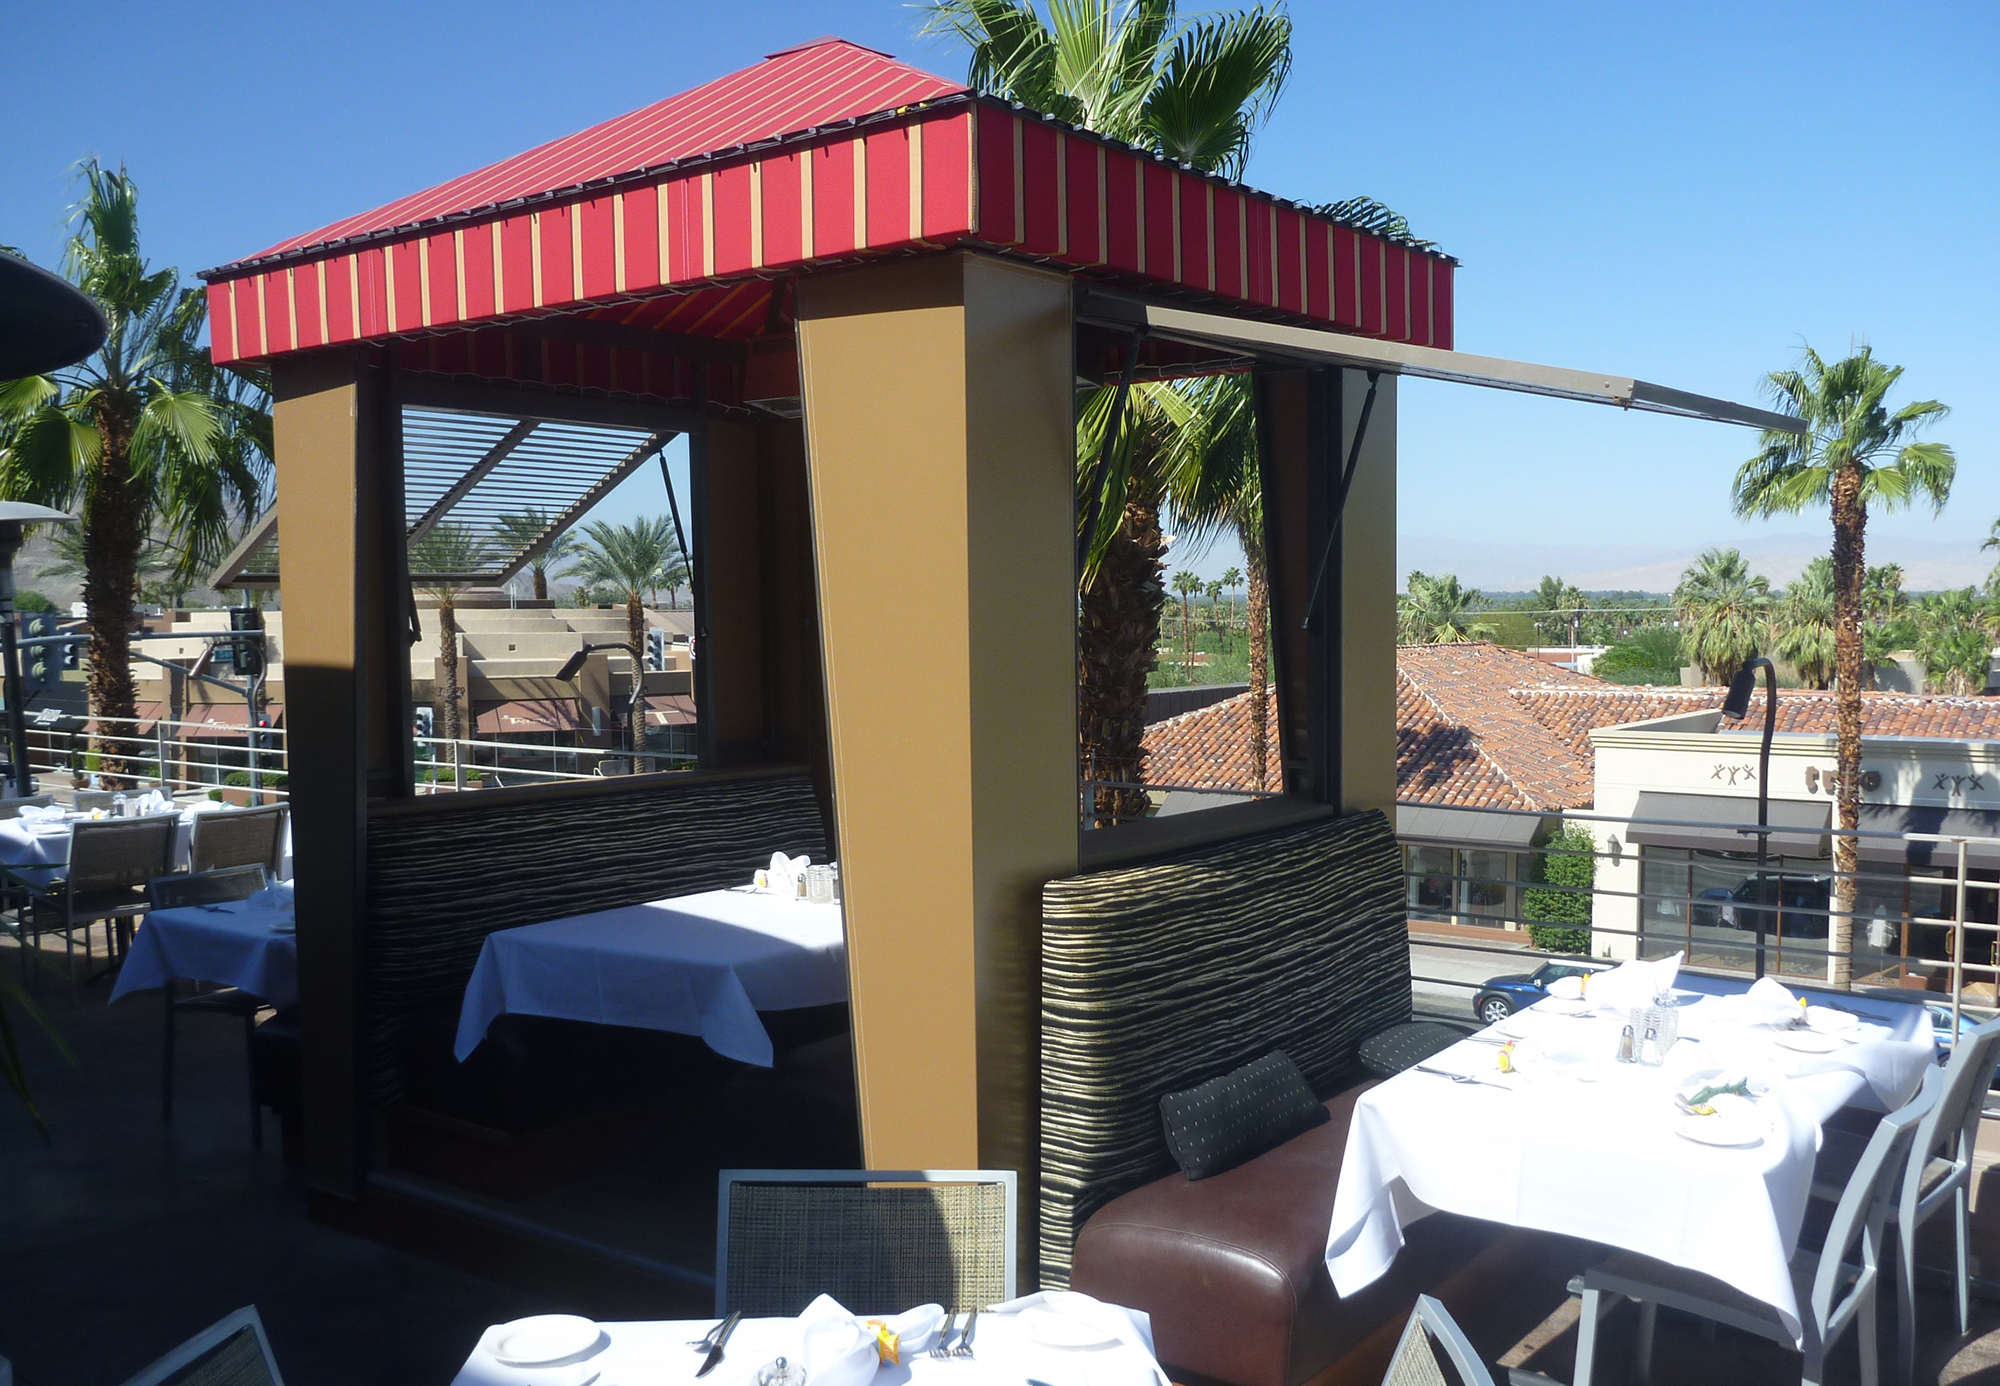 21-Cabana-Dining.jpg